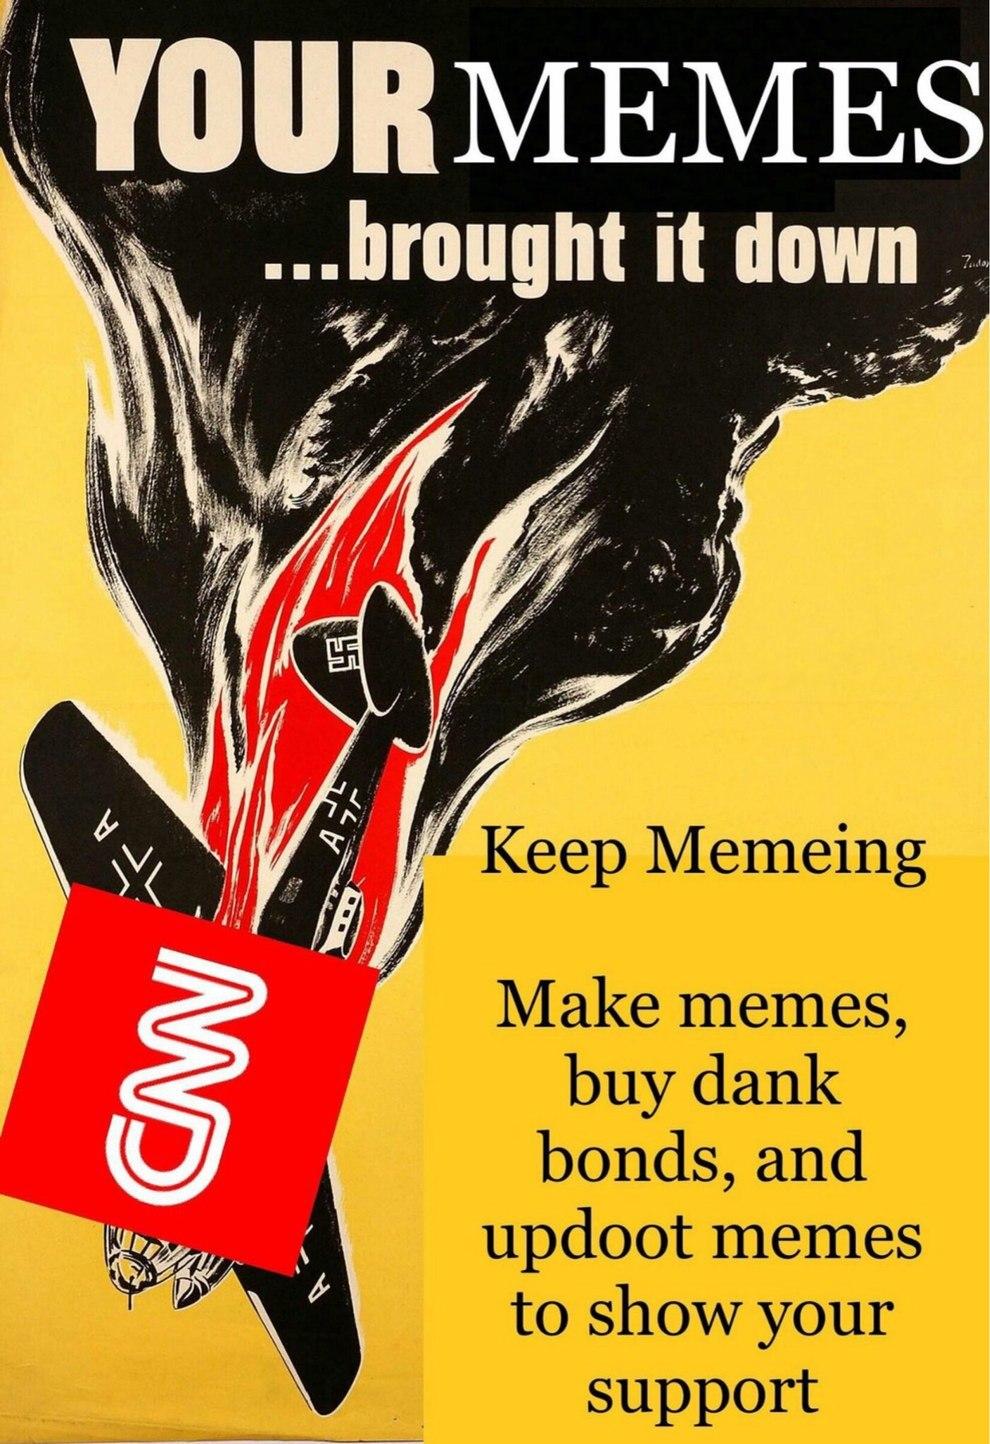 keep em coming a while ago - meme